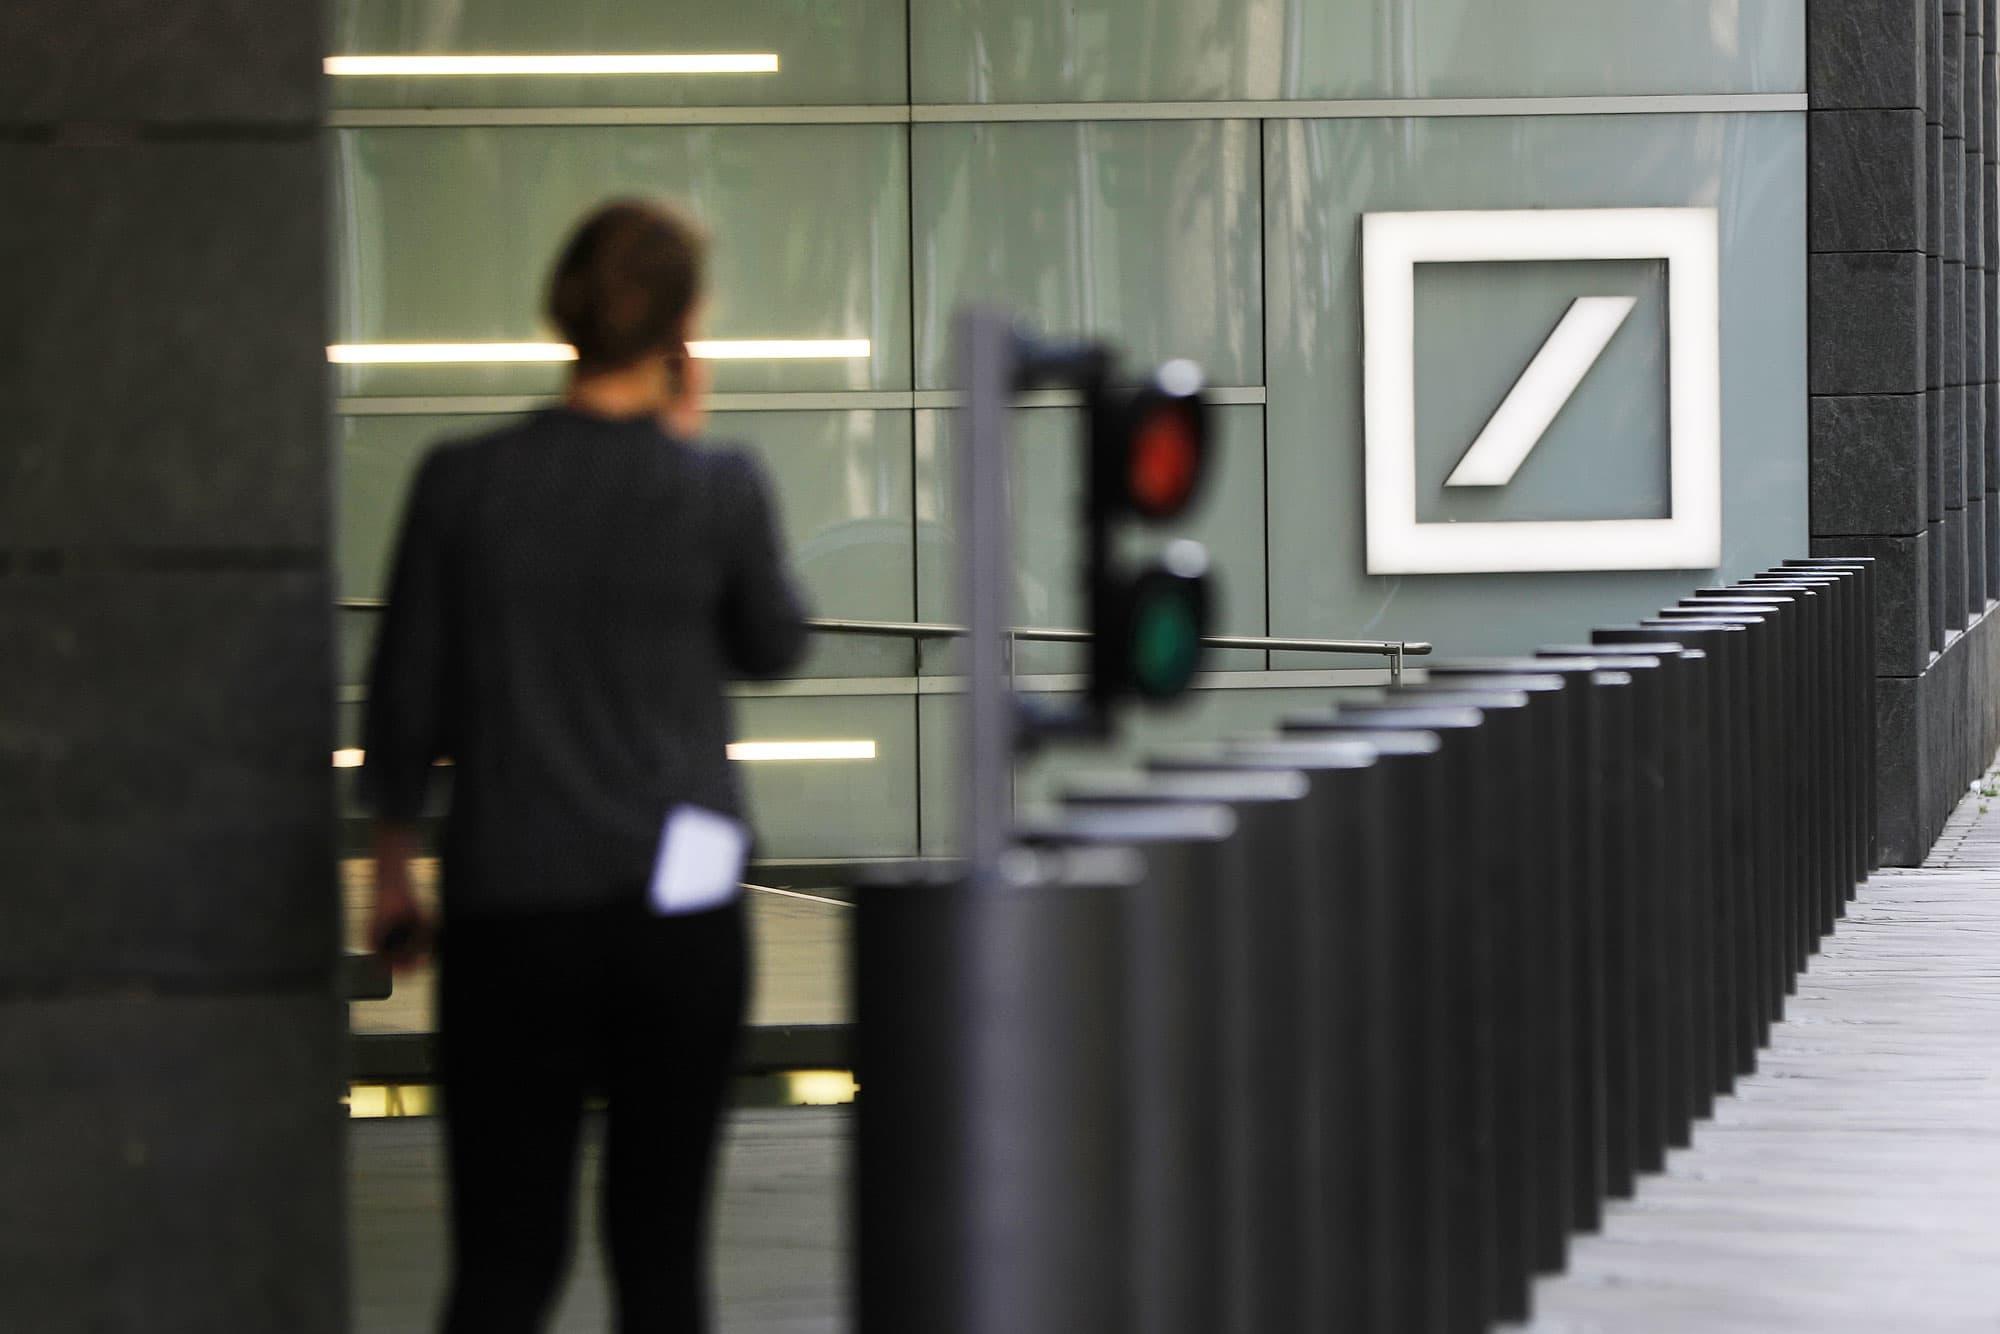 Deutsche Bank to reportedly set up 50 billion euro bad bank; shares pop over 3%